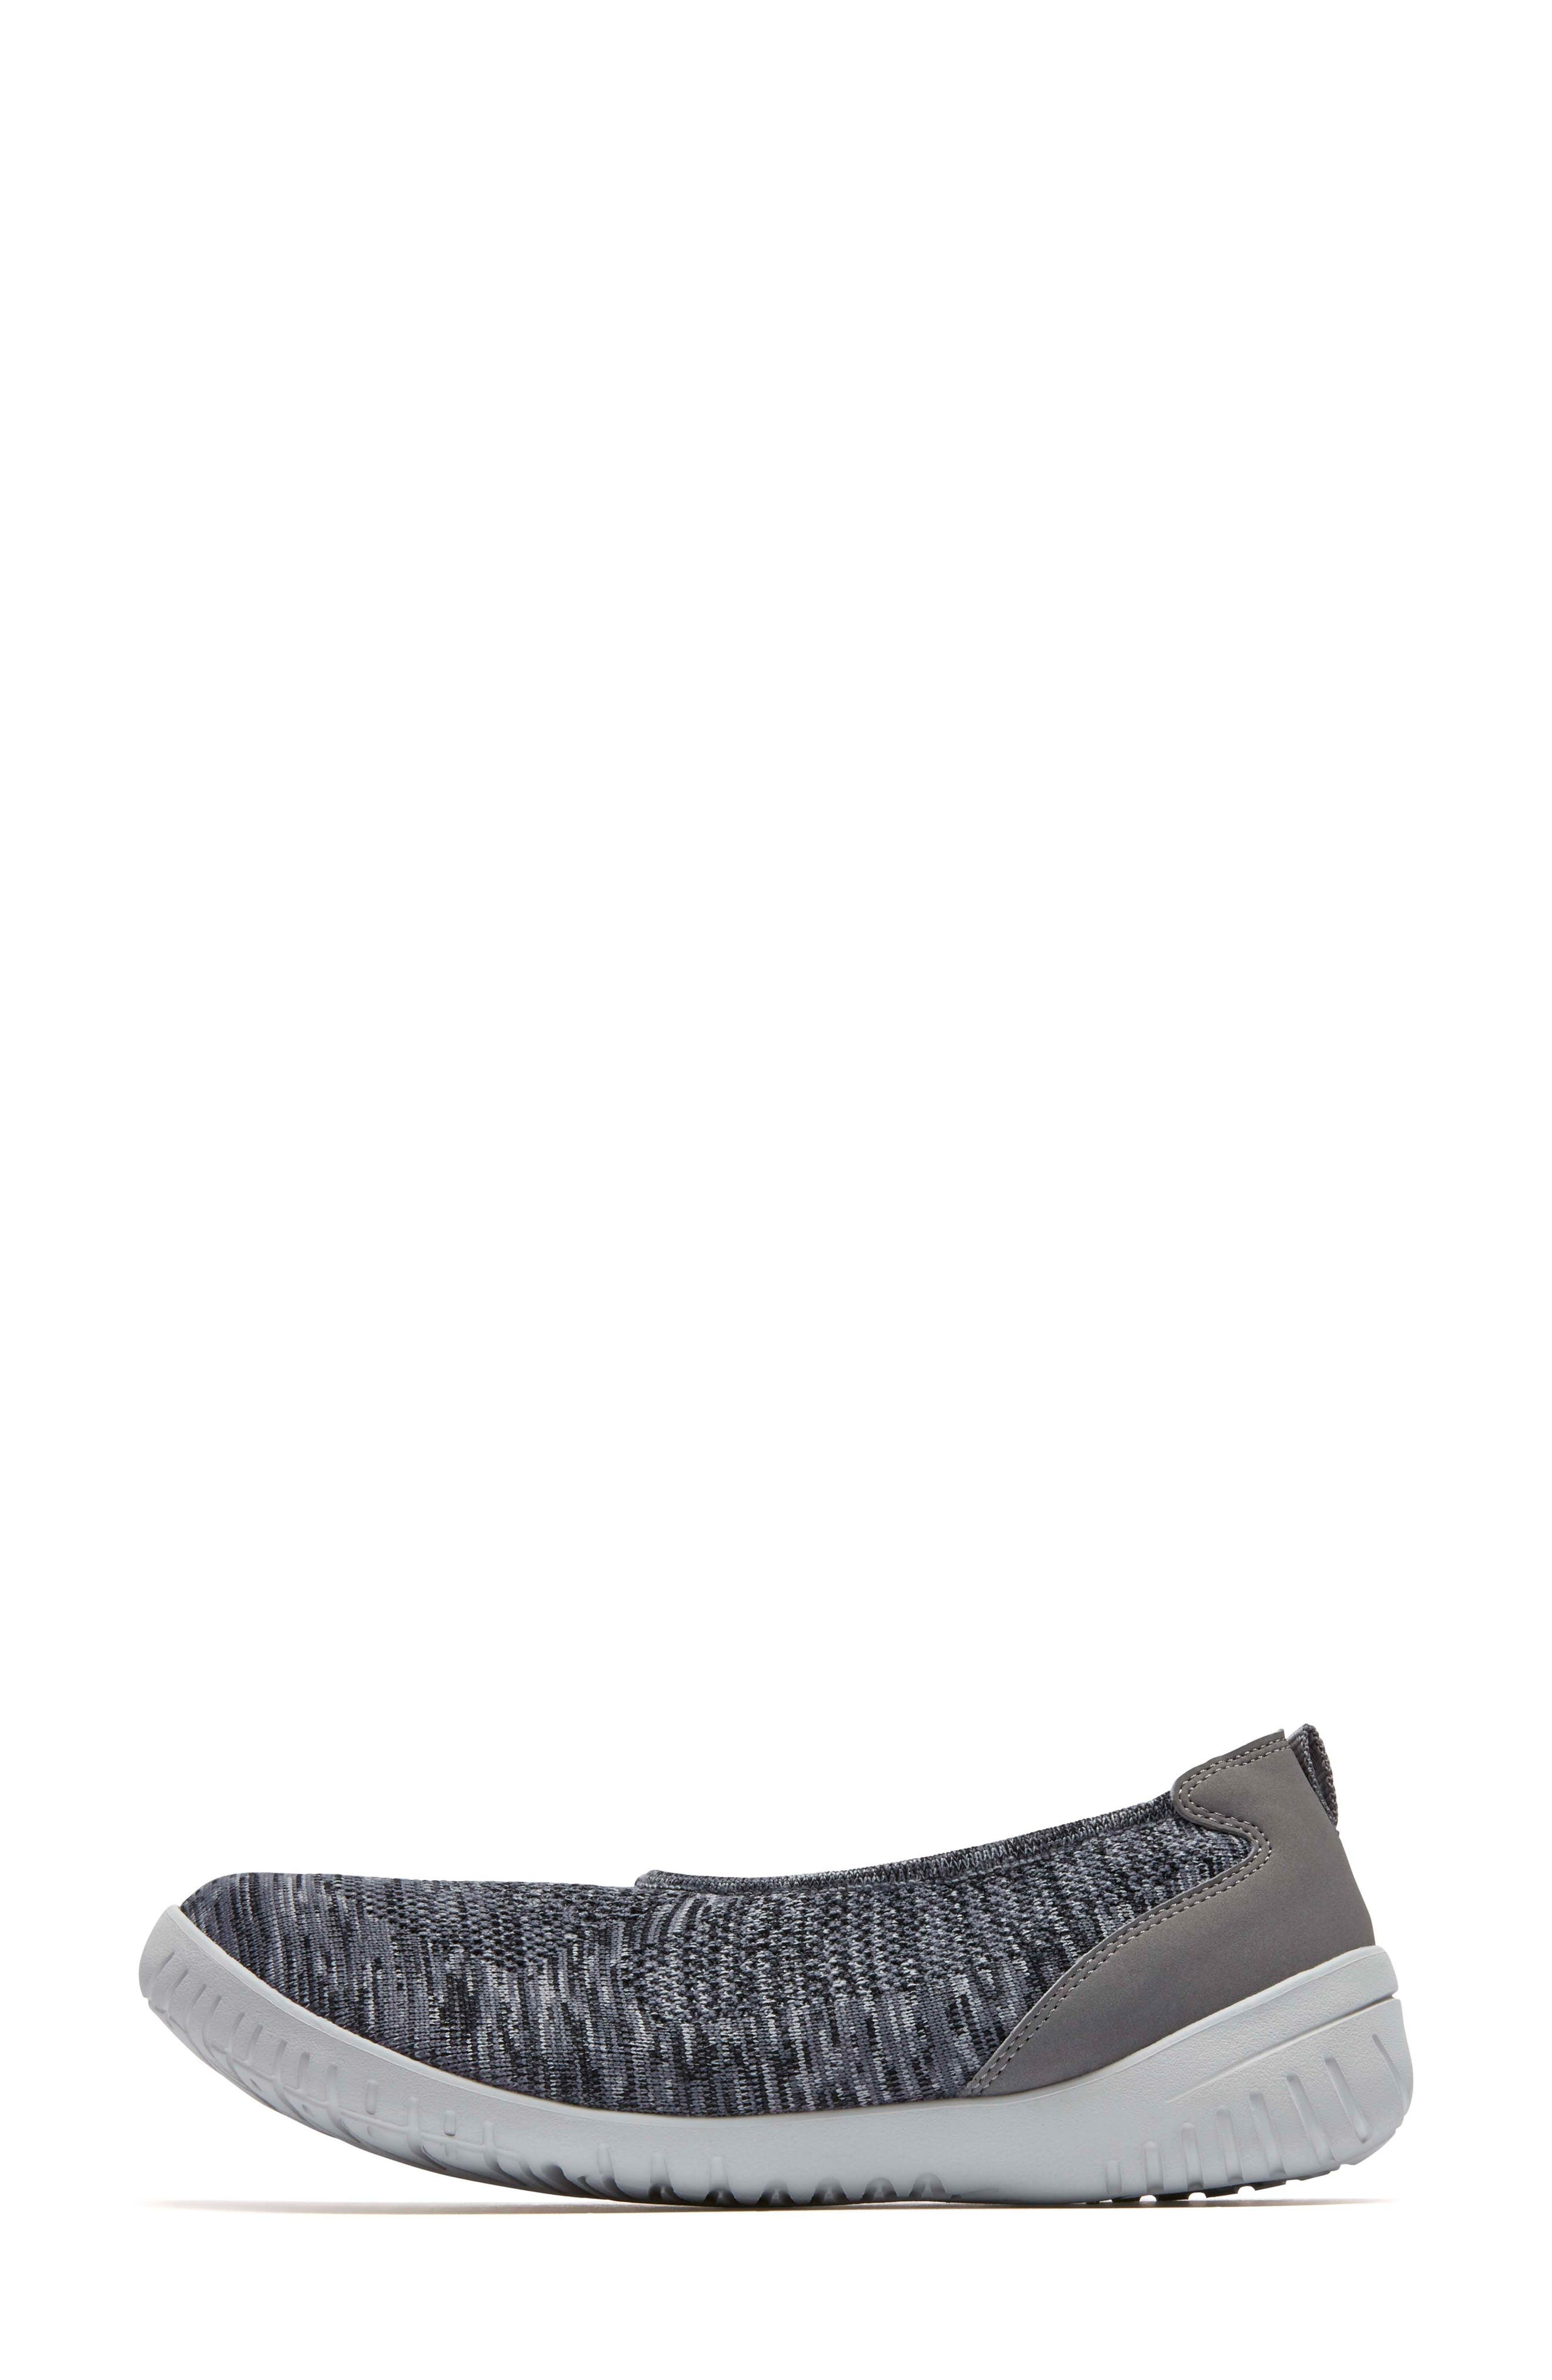 Raelyn Knit Ballet Sneaker,                             Alternate thumbnail 2, color,                             Dark Grey Heather Fabric